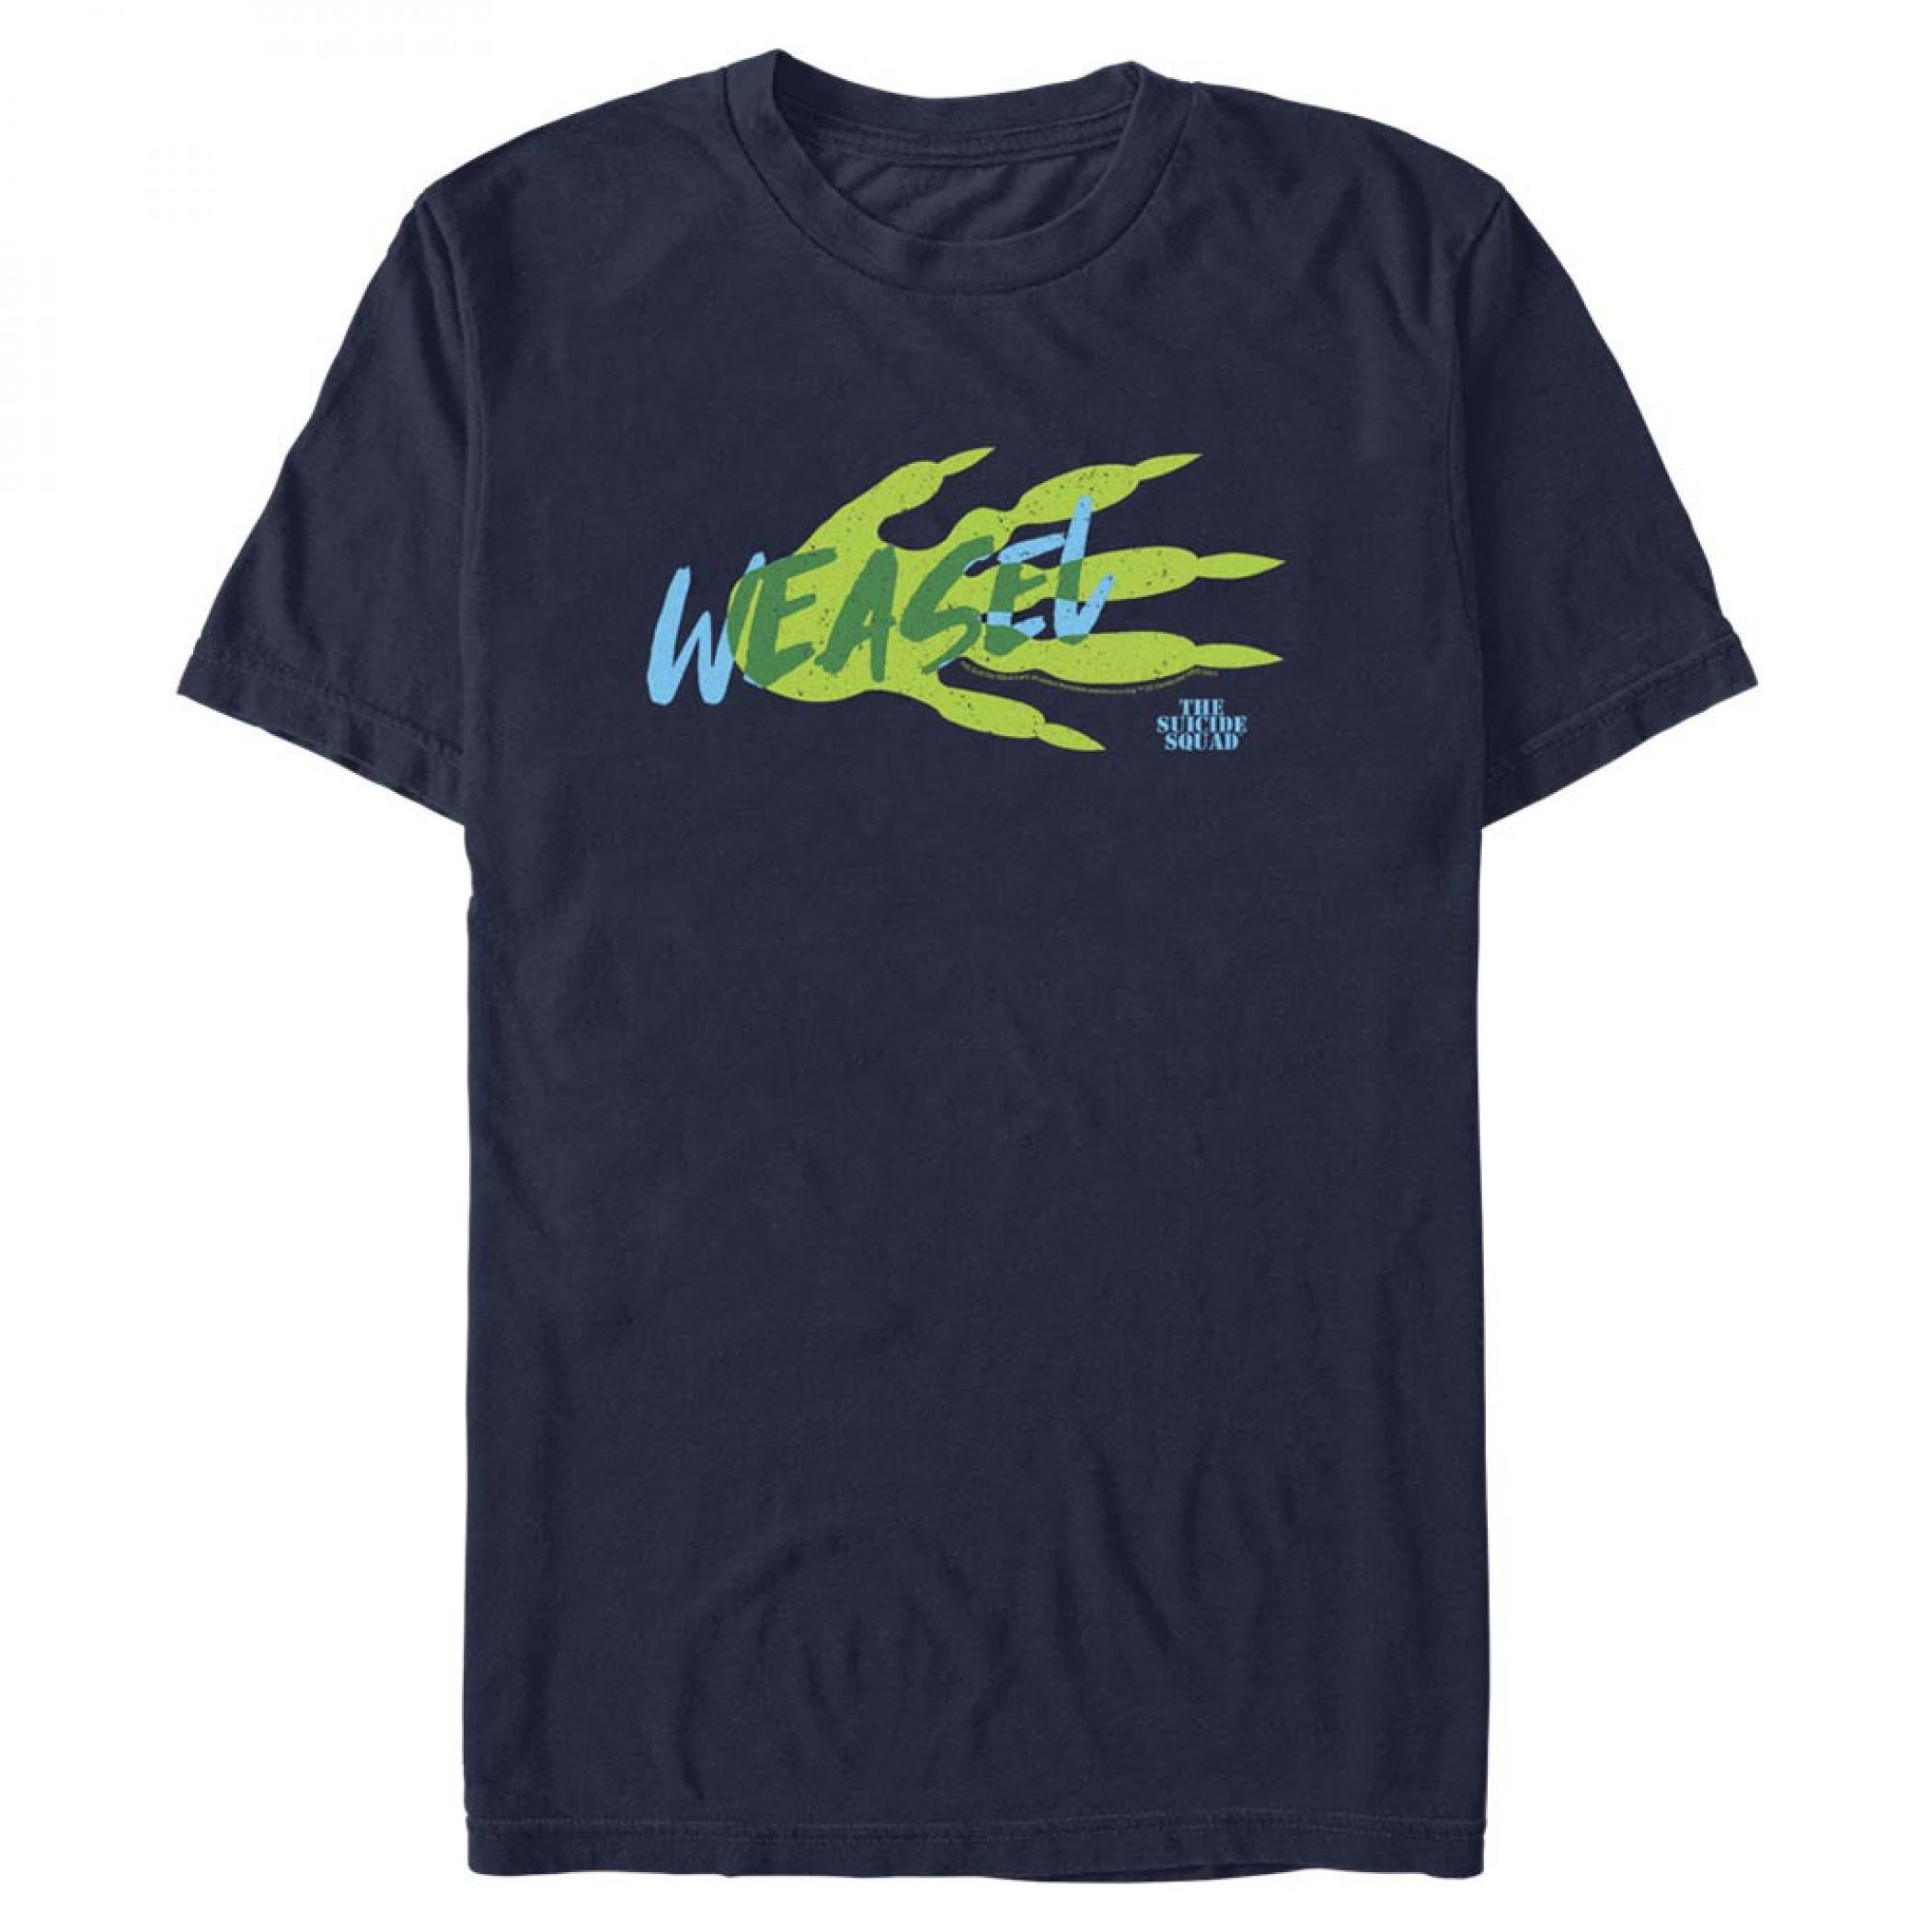 The Suicide Squad Weasel Stylized Logo Men's T-Shirt